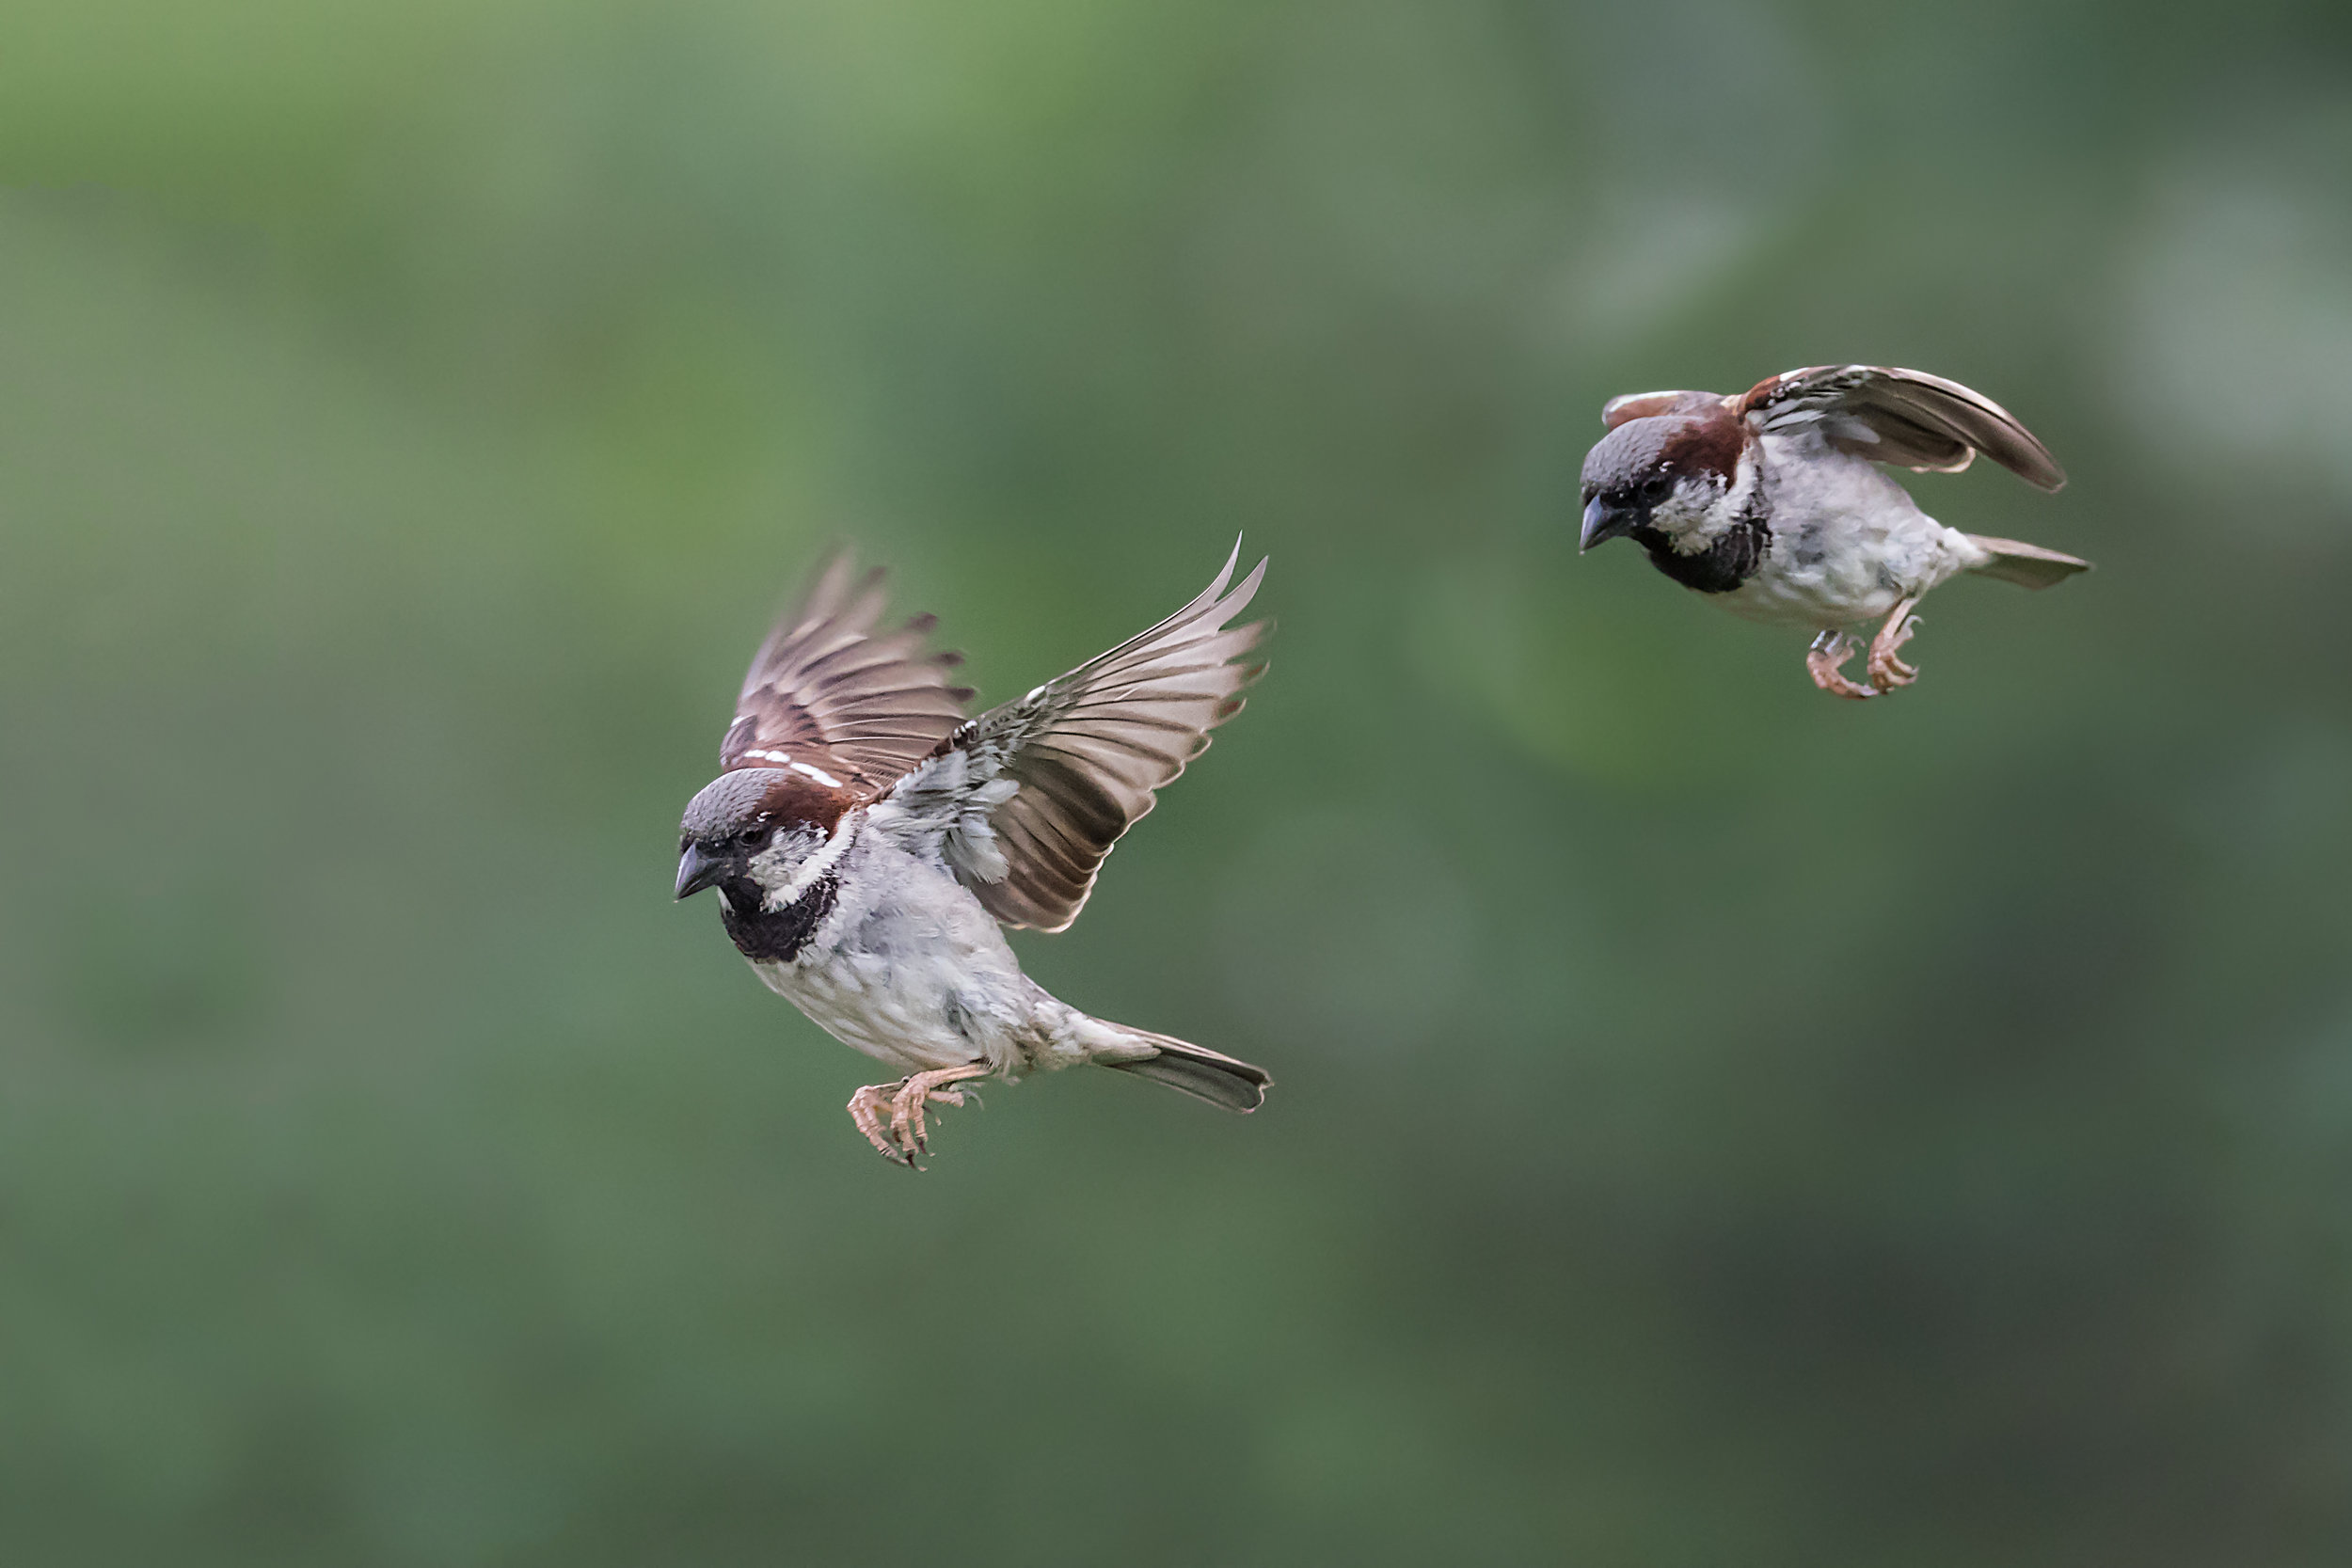 Male Sparrow flight path (composite)